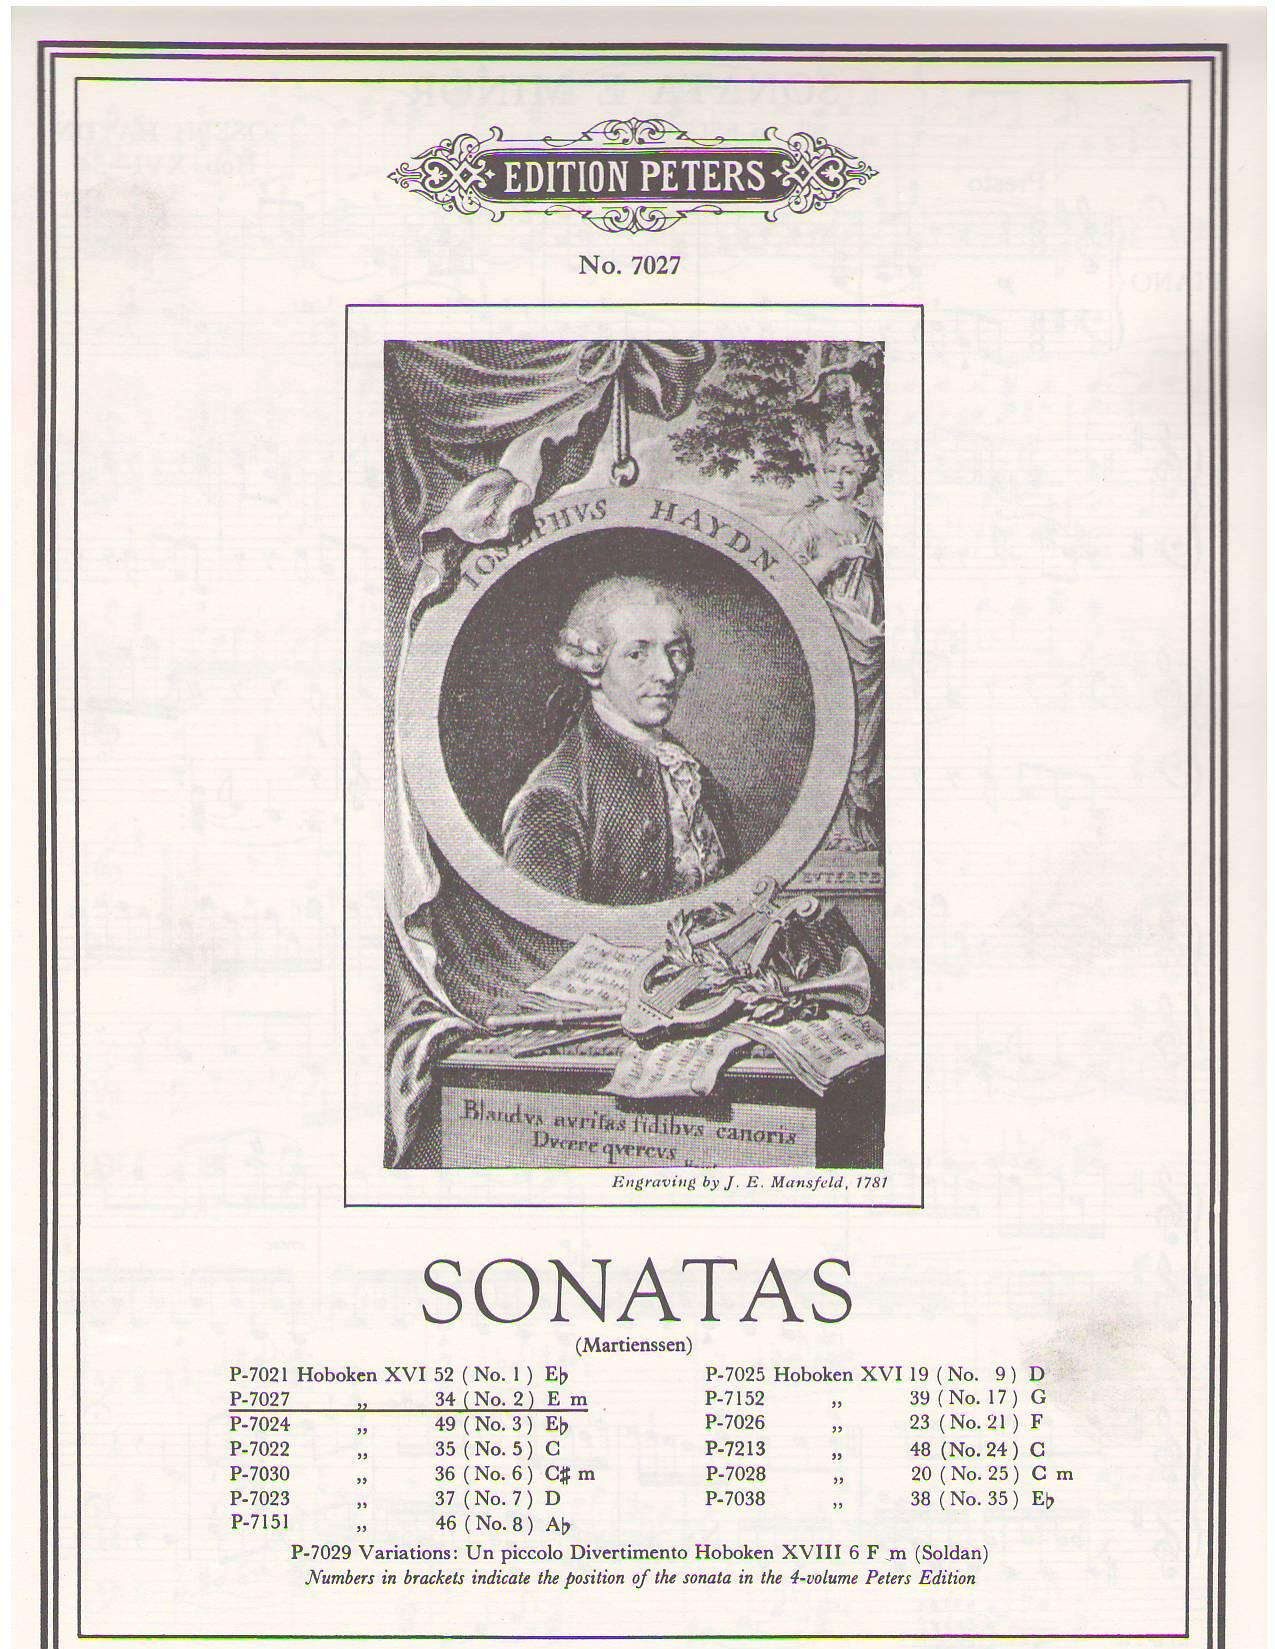 theory analysis on haydns piano sonata Form and analysis depauw university piano sonata in d major, haydn this piano sonata is in 5 part rondo form.